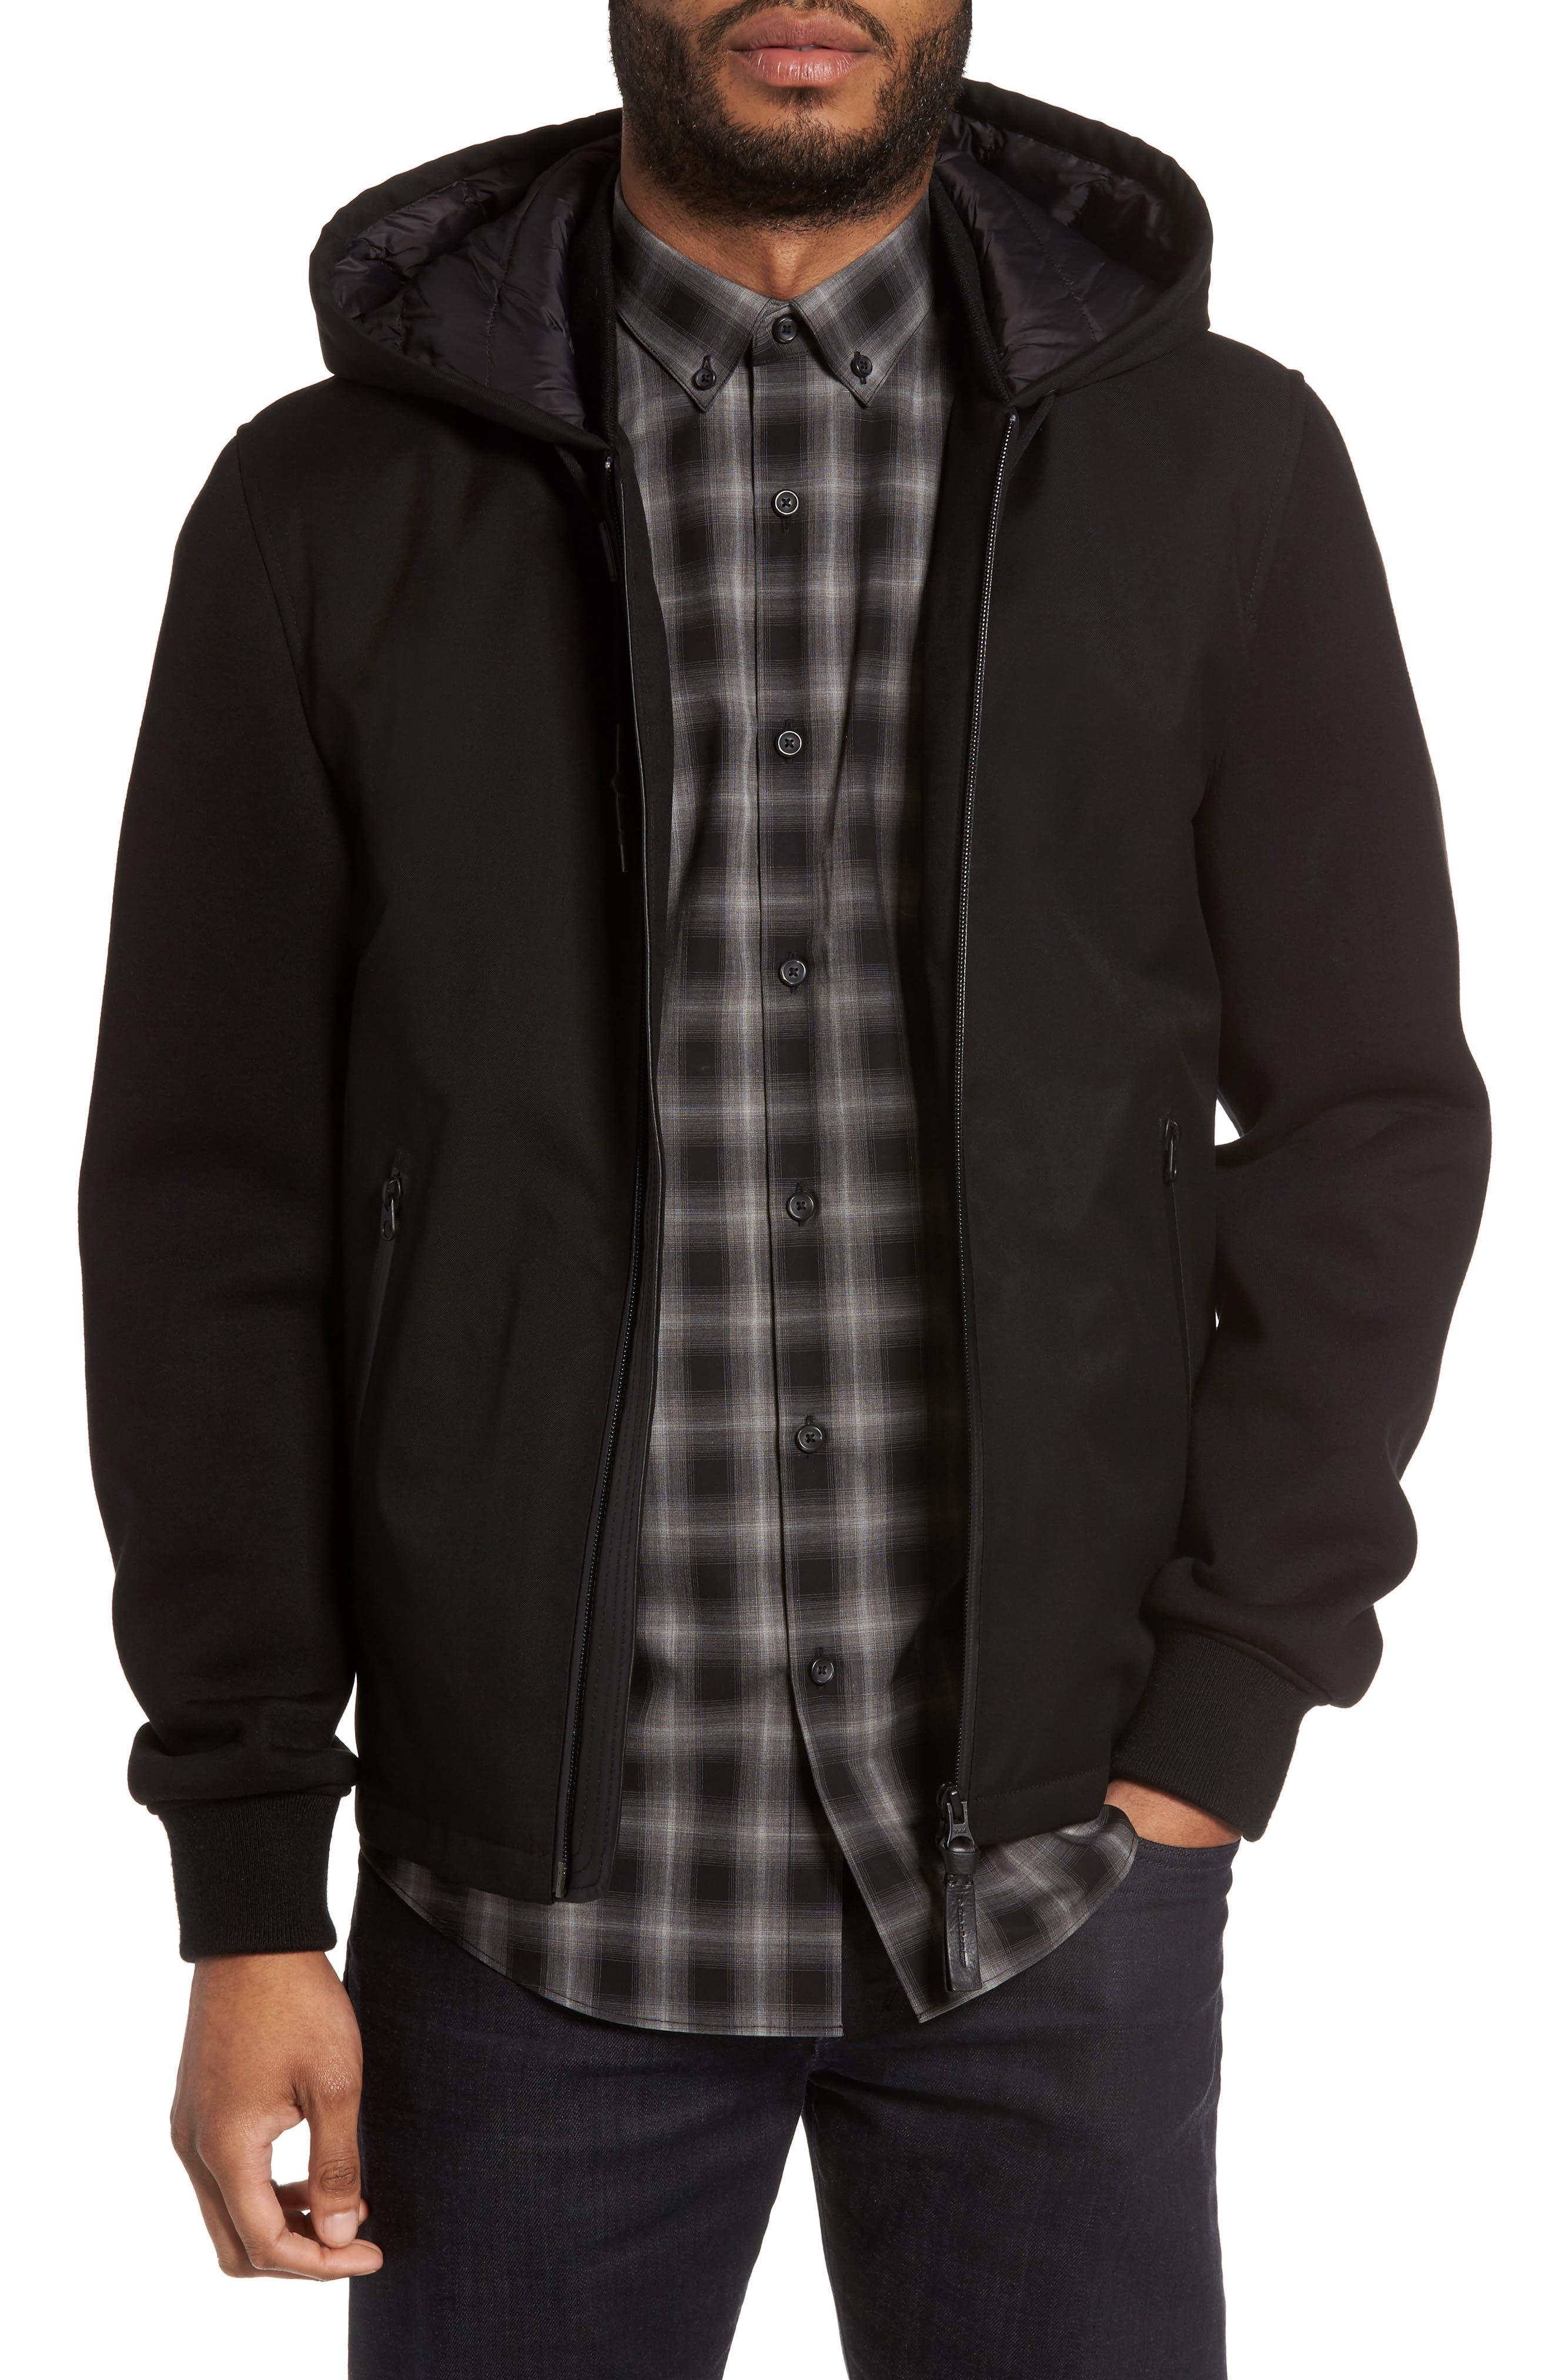 Mackage Mixed Media Hooded Jacket